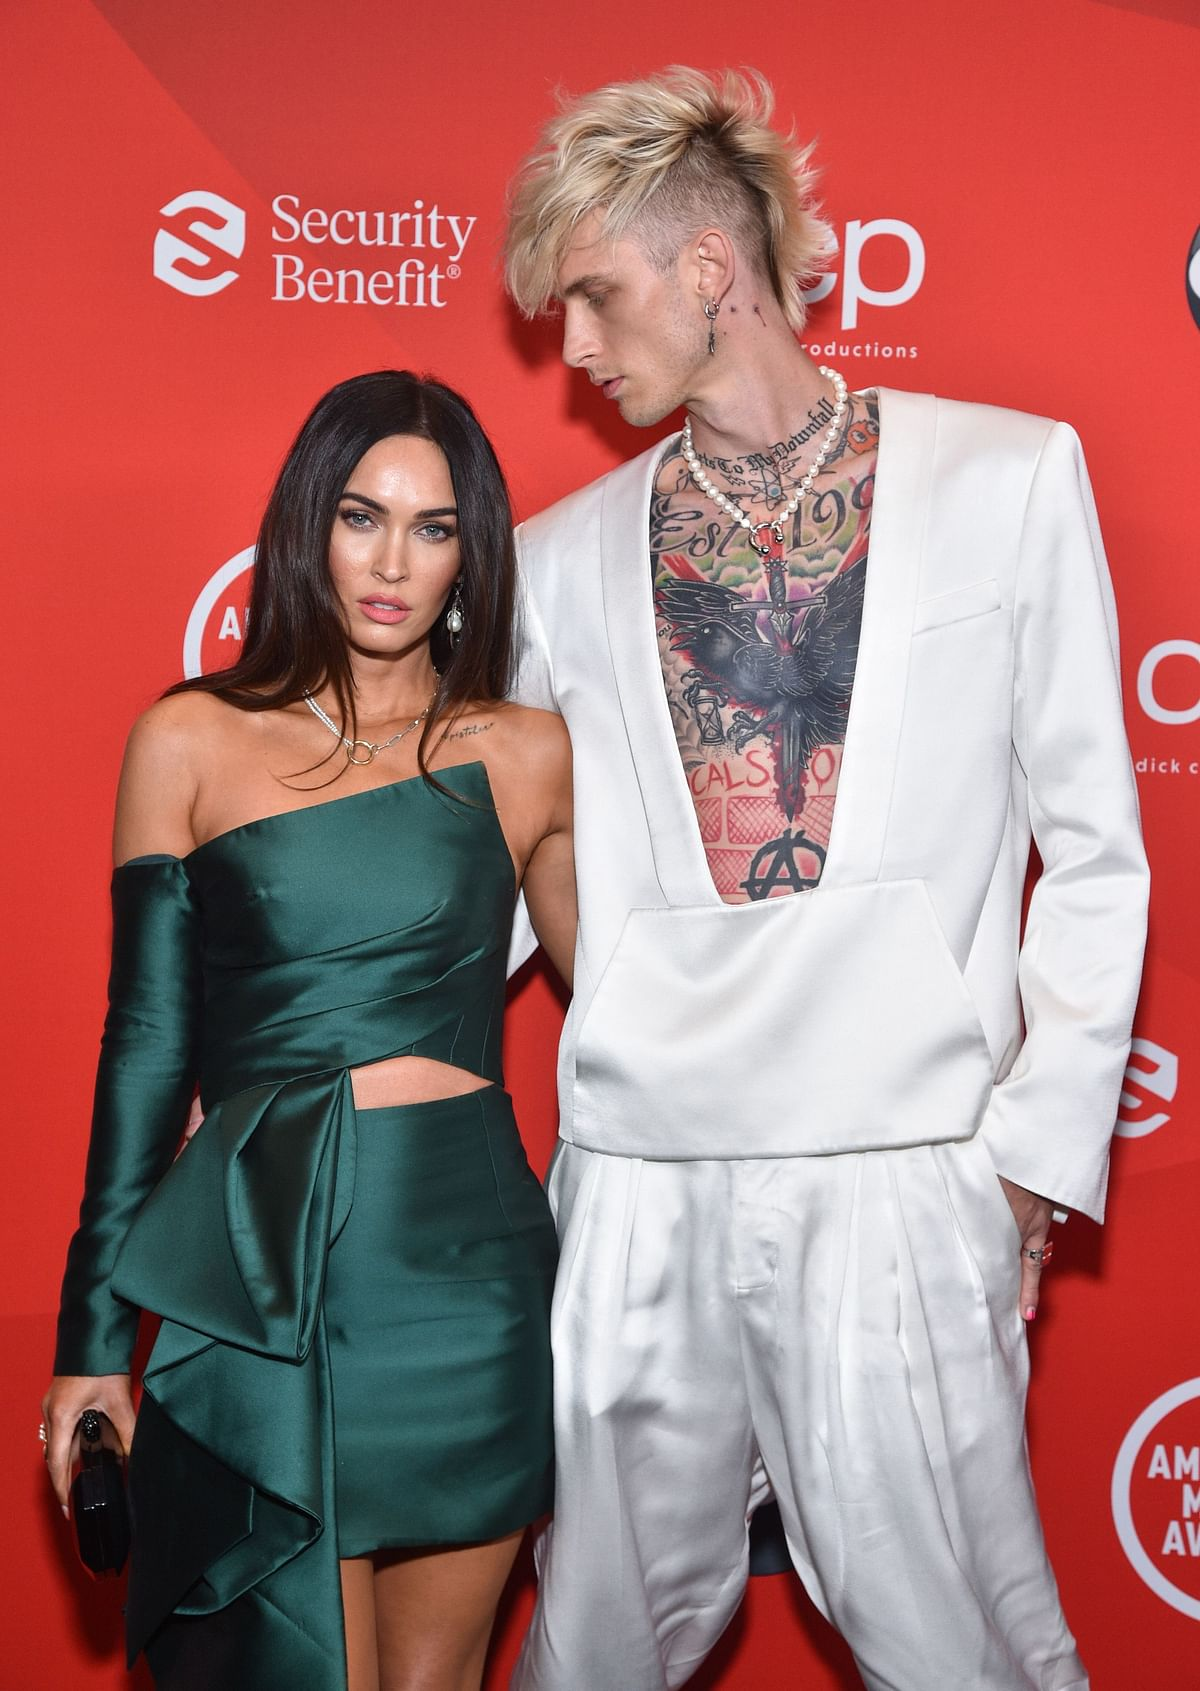 2020 AMAs: Megan Fox, Machine Gun Kelly make their red carpet debut as couple; see pics